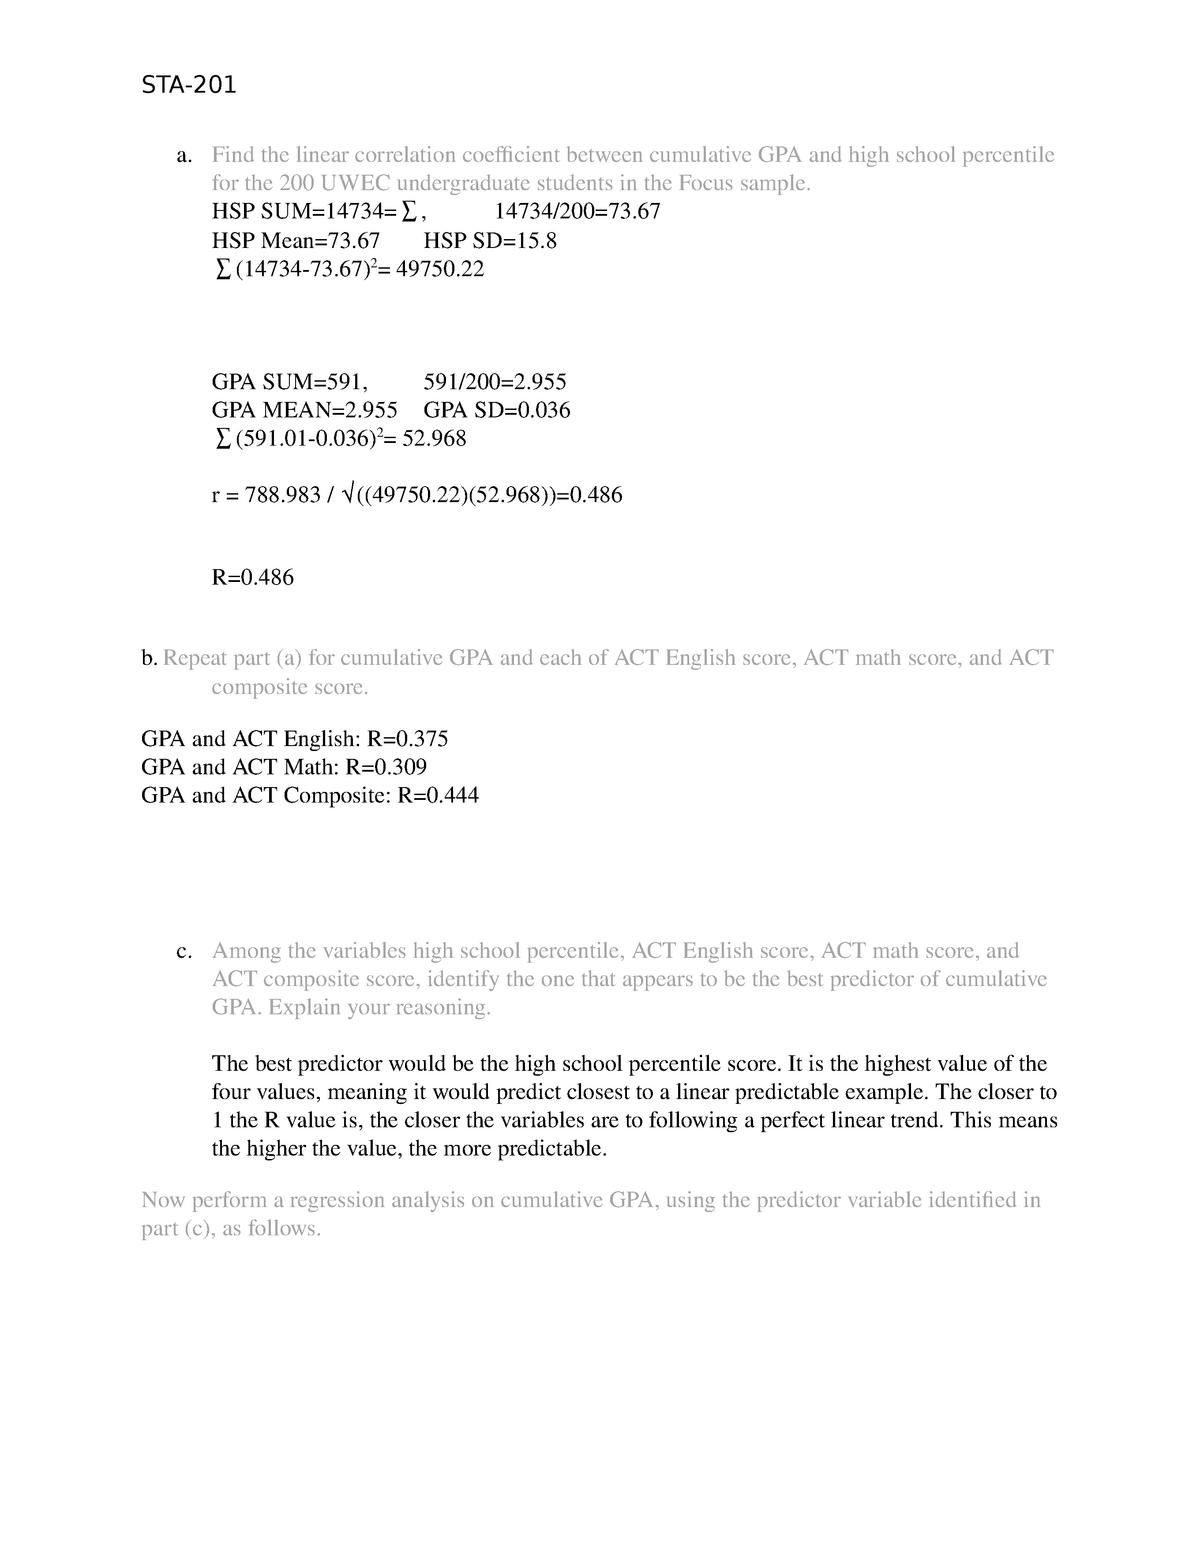 Module 6 Written Assignment - STA-201 - TESU - StuDocu